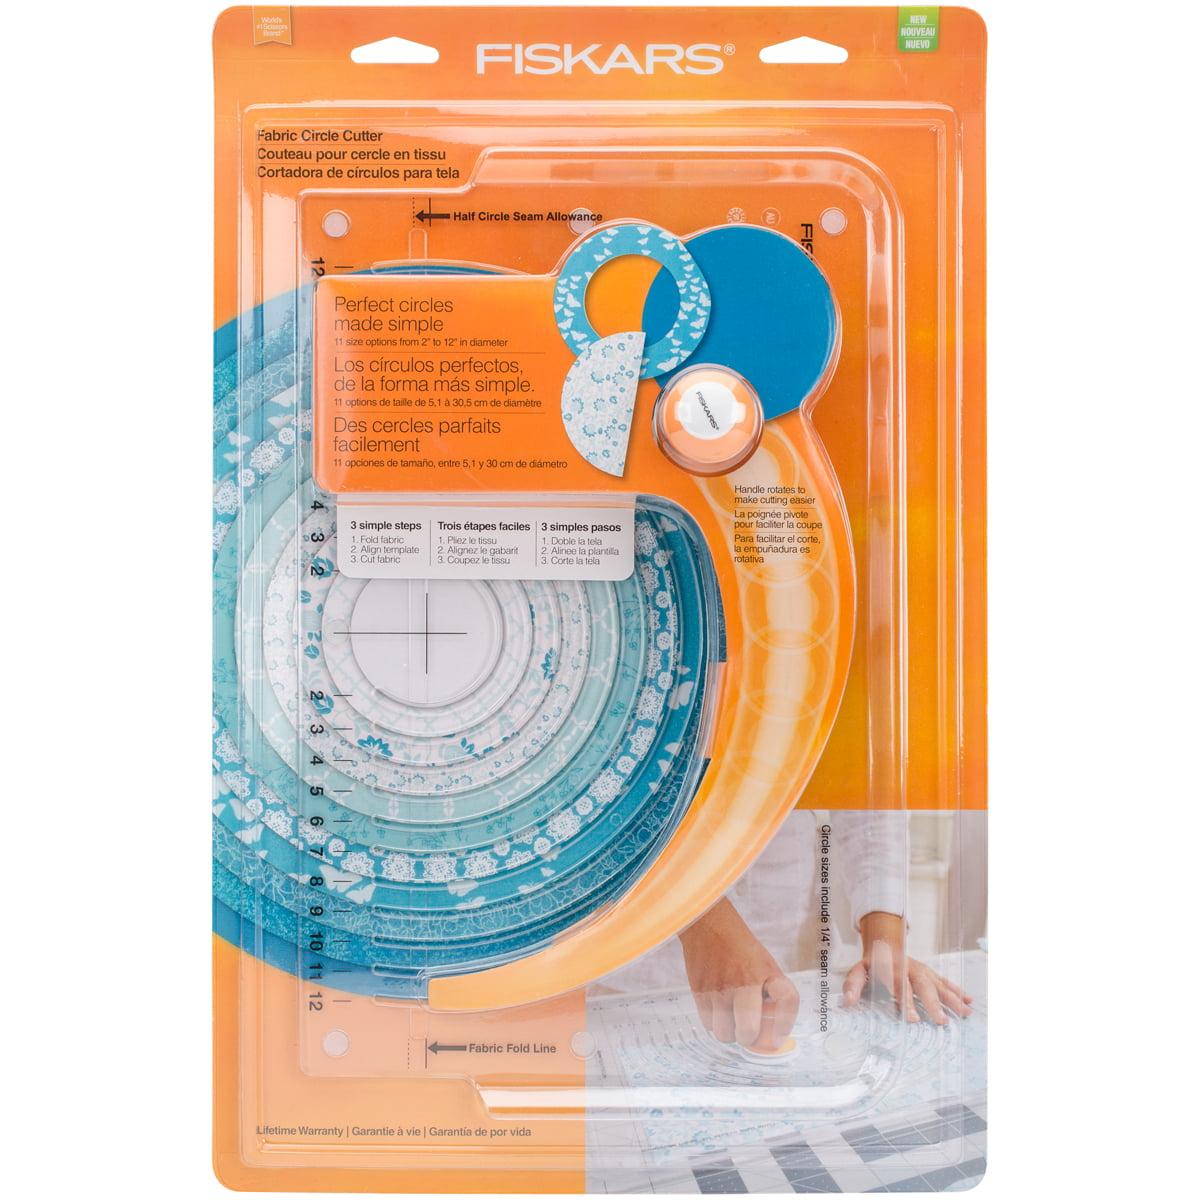 Fiskars Fabric Circle Cutter Blade Walmart